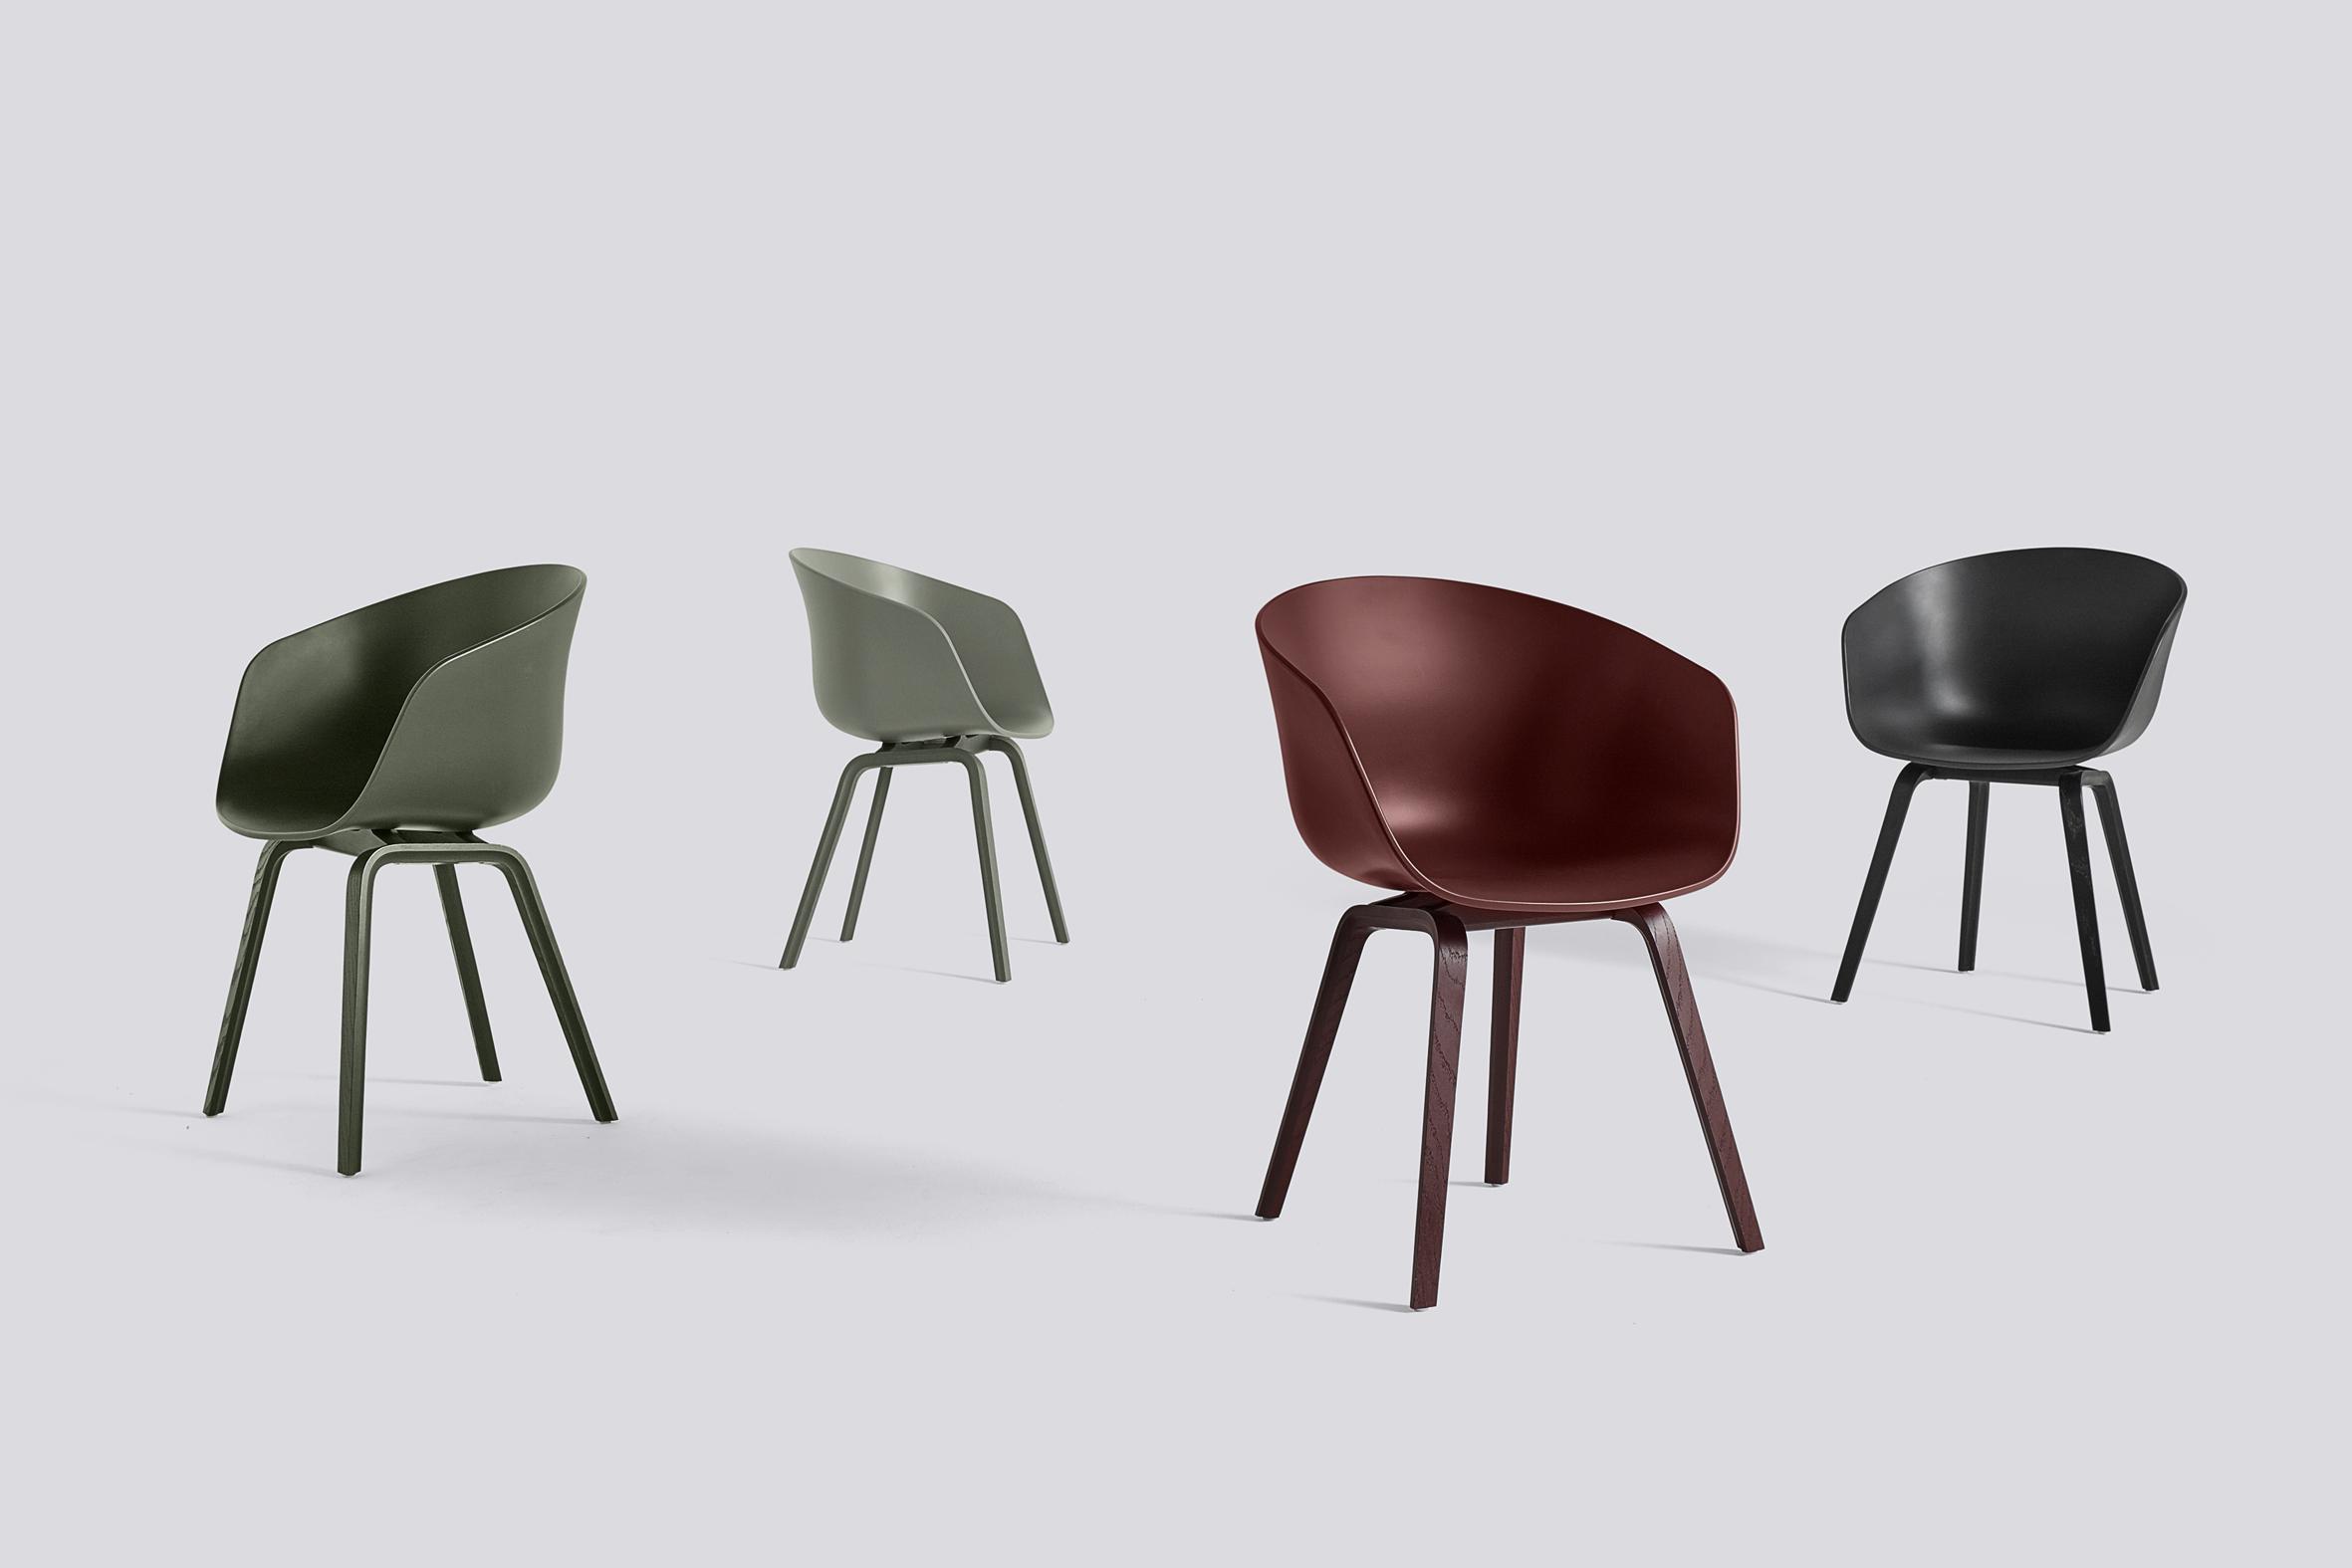 Hay About A Chair Aac22 Dusty Green Möbel Design Köln